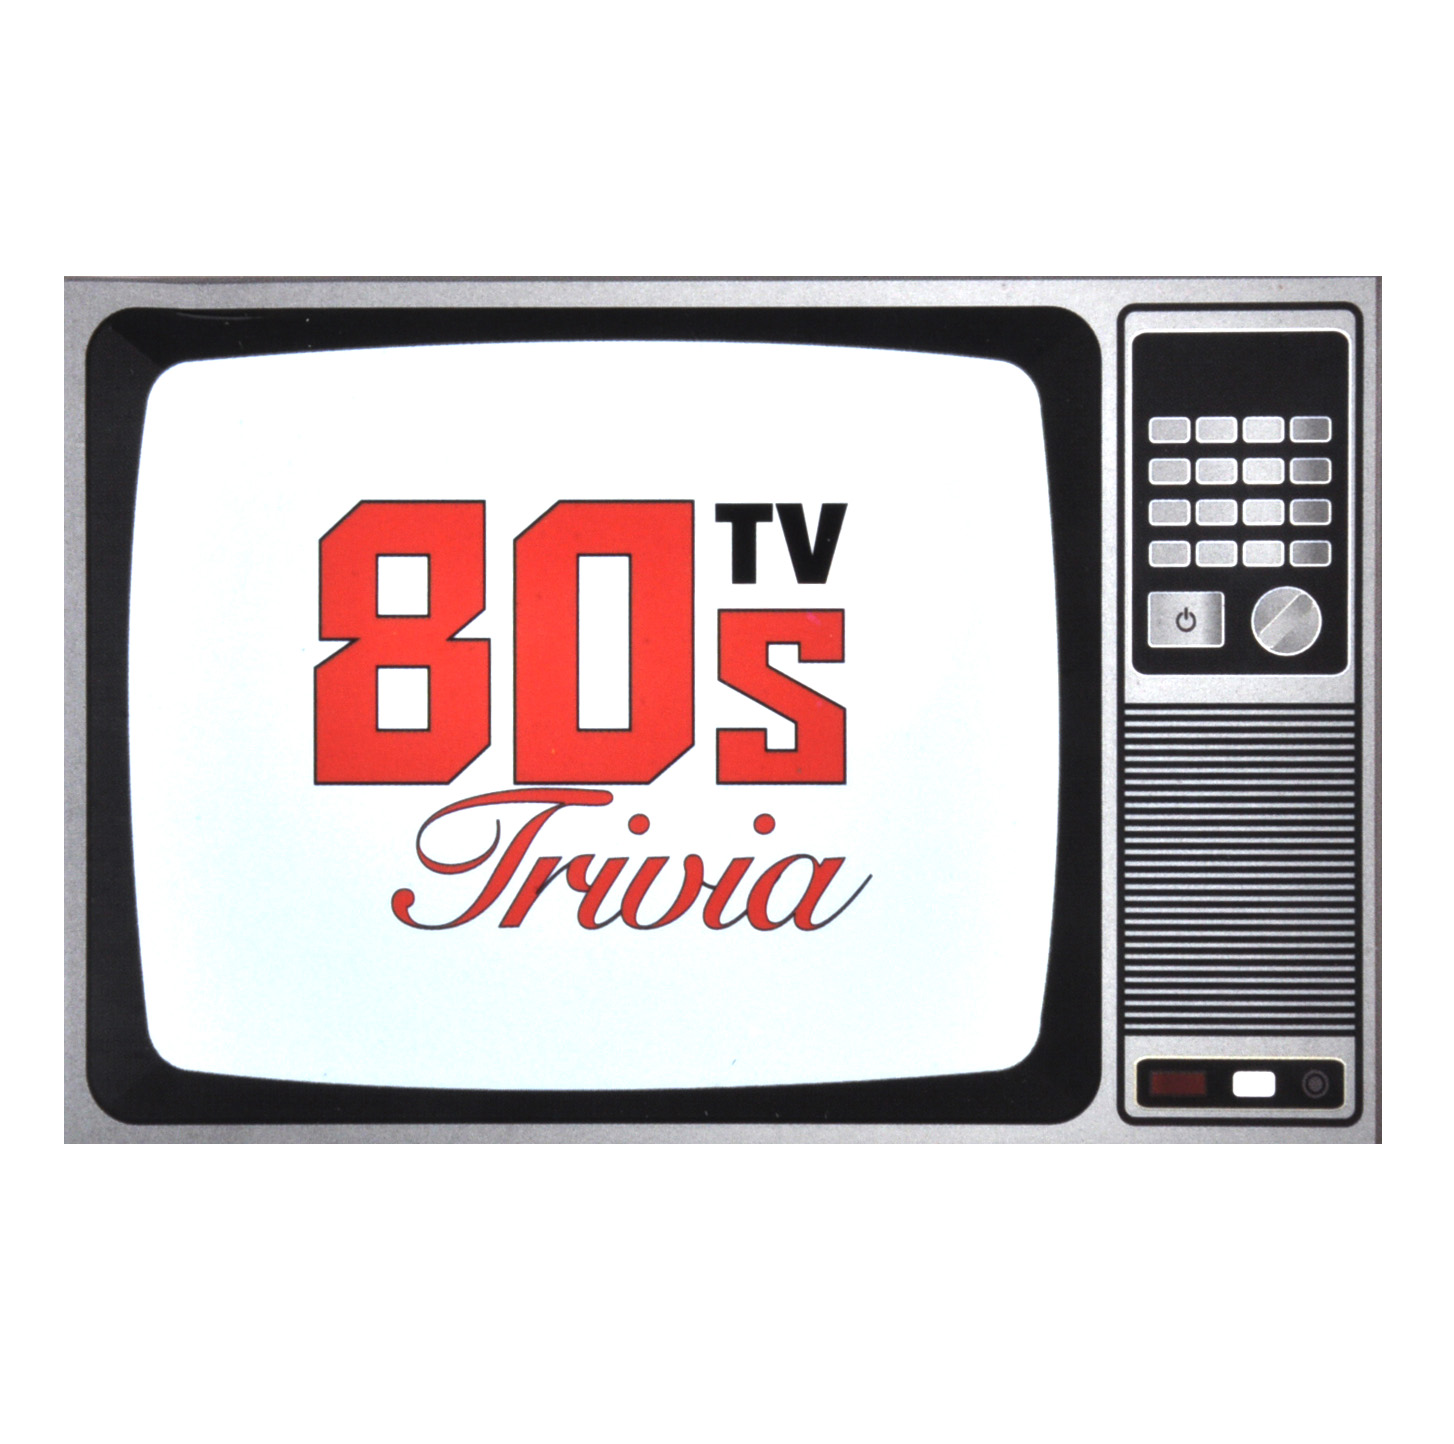 Details about 80's TV Trivia